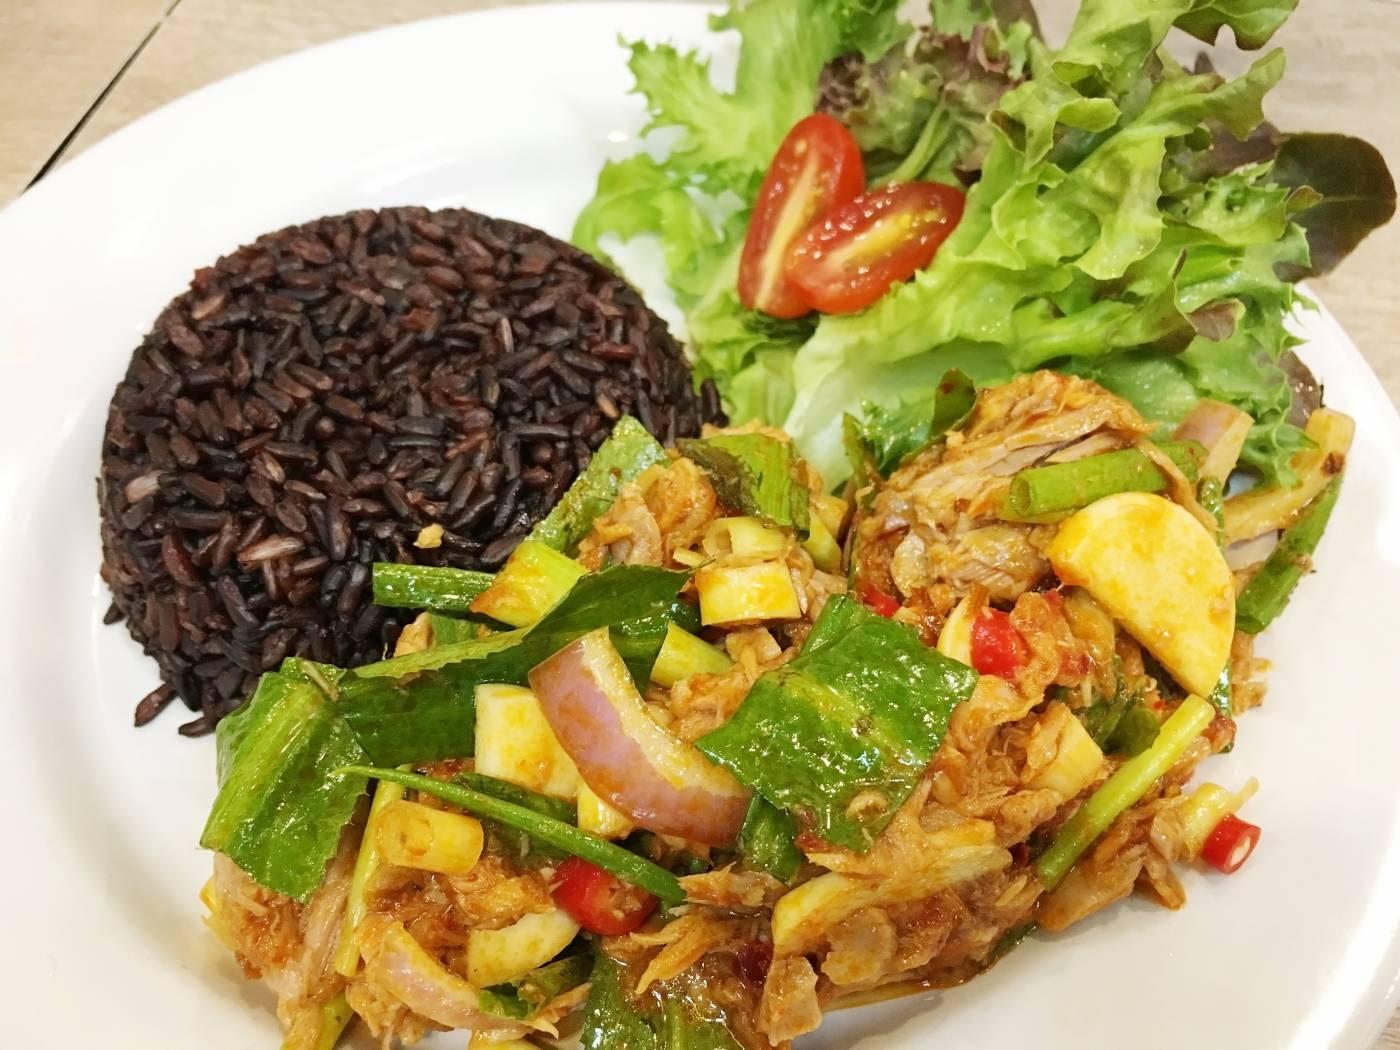 Tuňákový salát s černou rýží